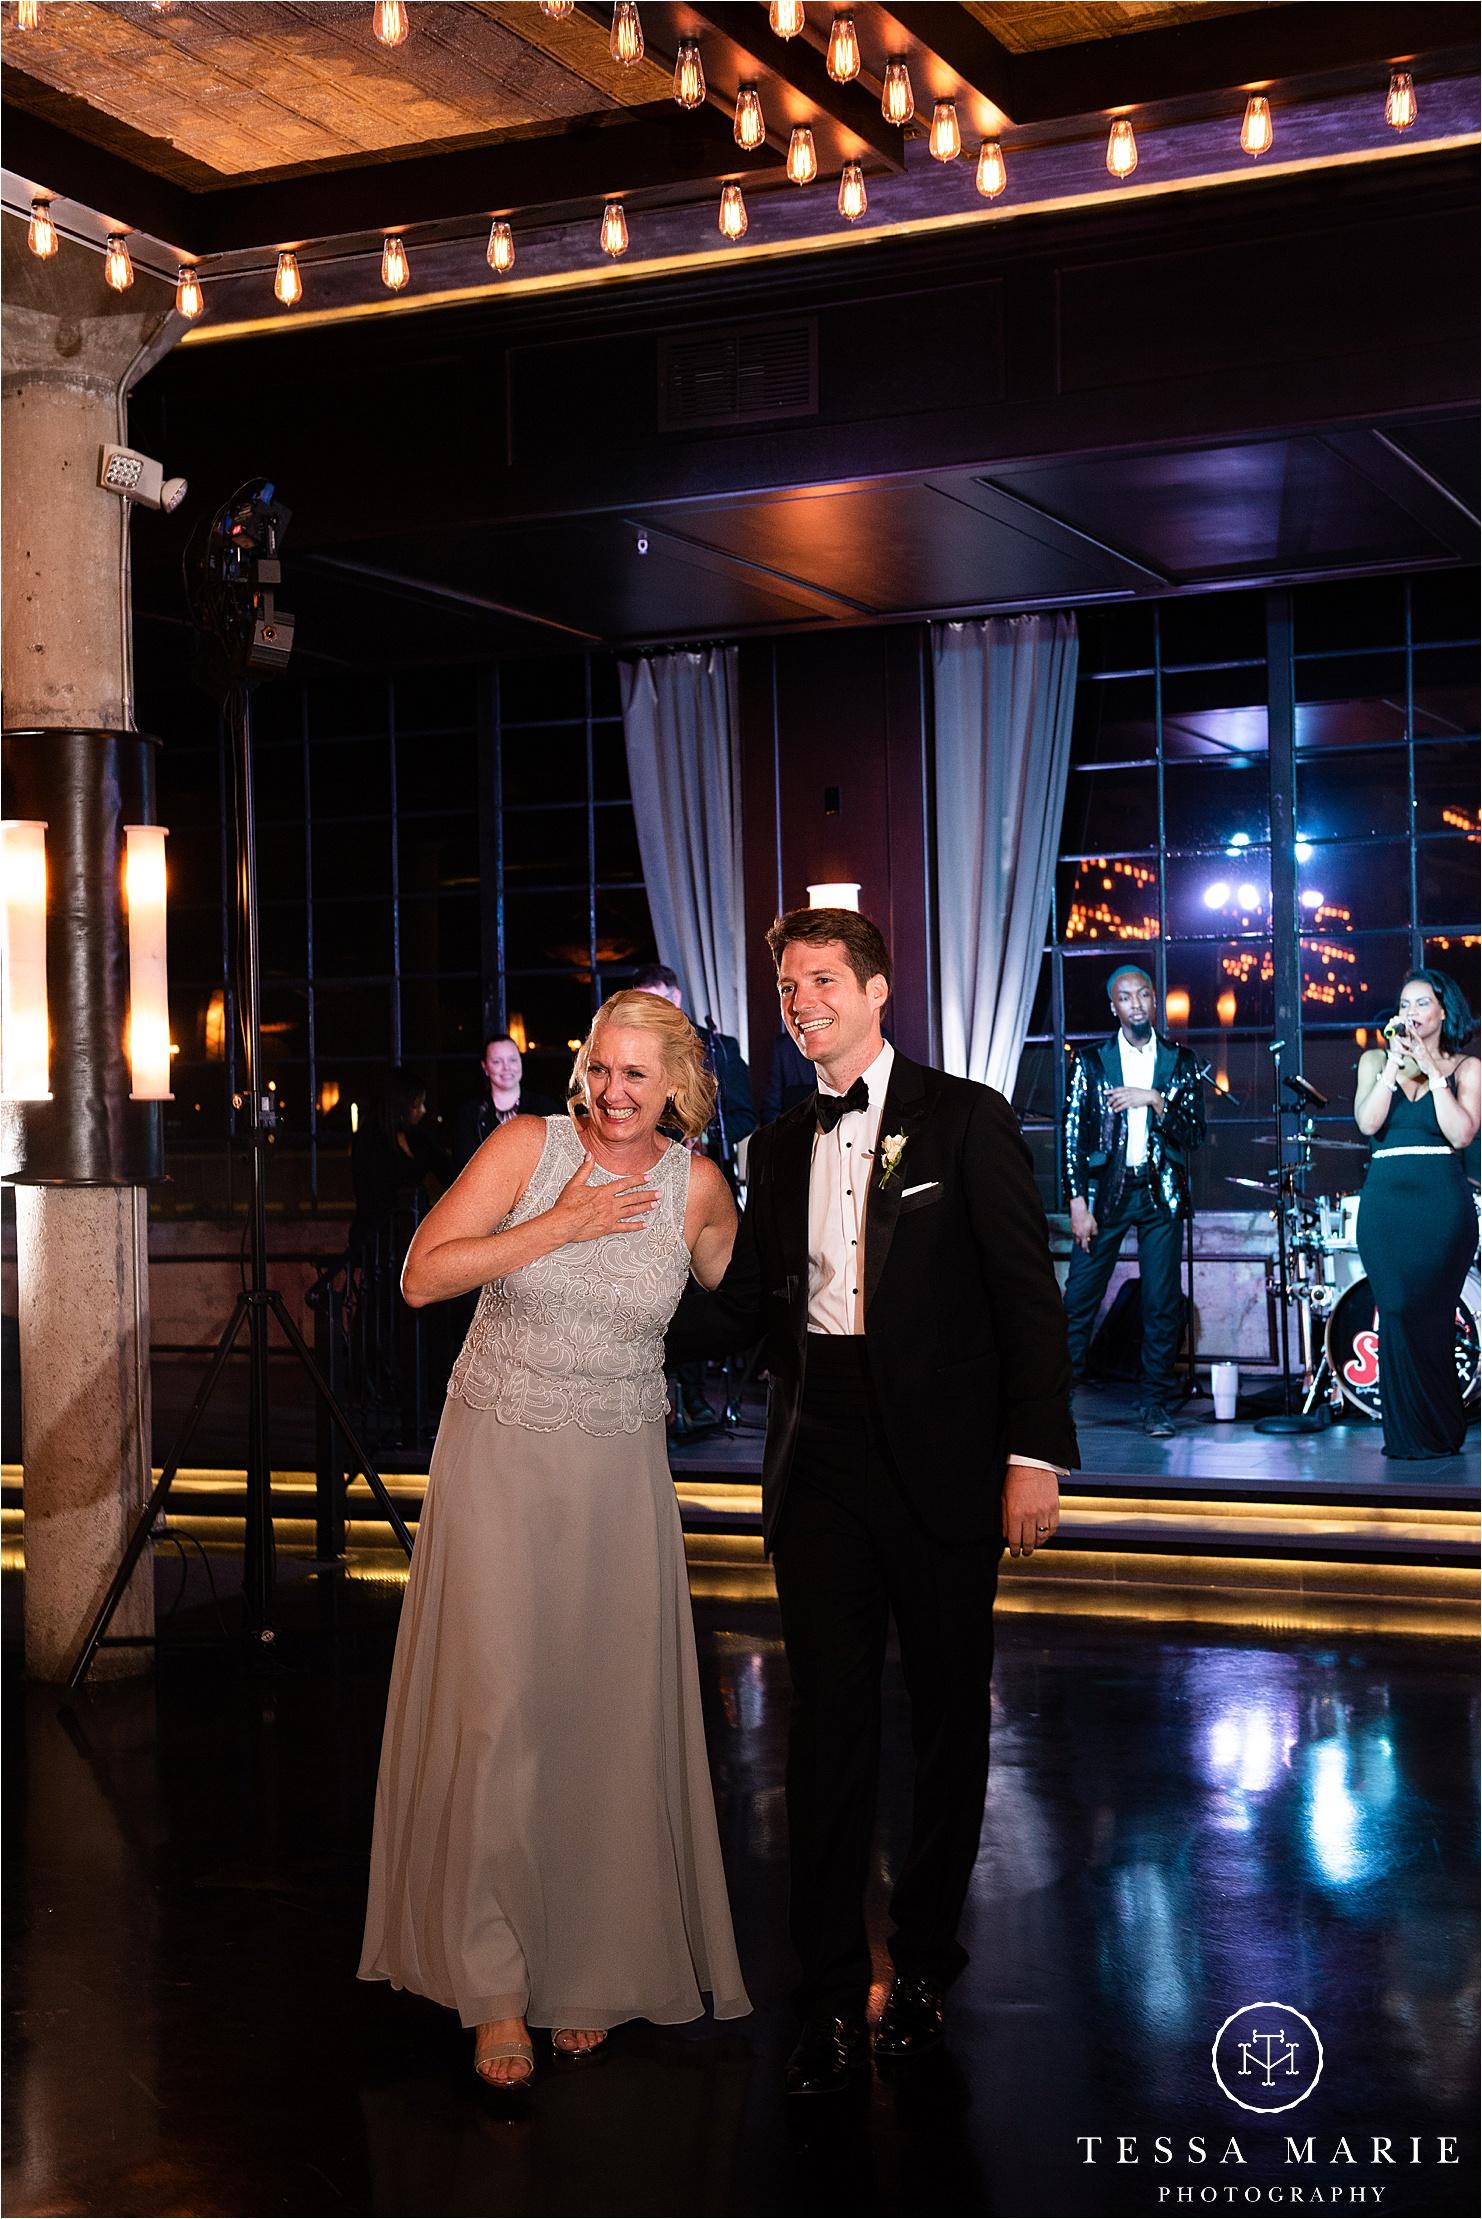 Tessa_marie_weddings_houston_wedding_photographer_The_astorian_0172.jpg